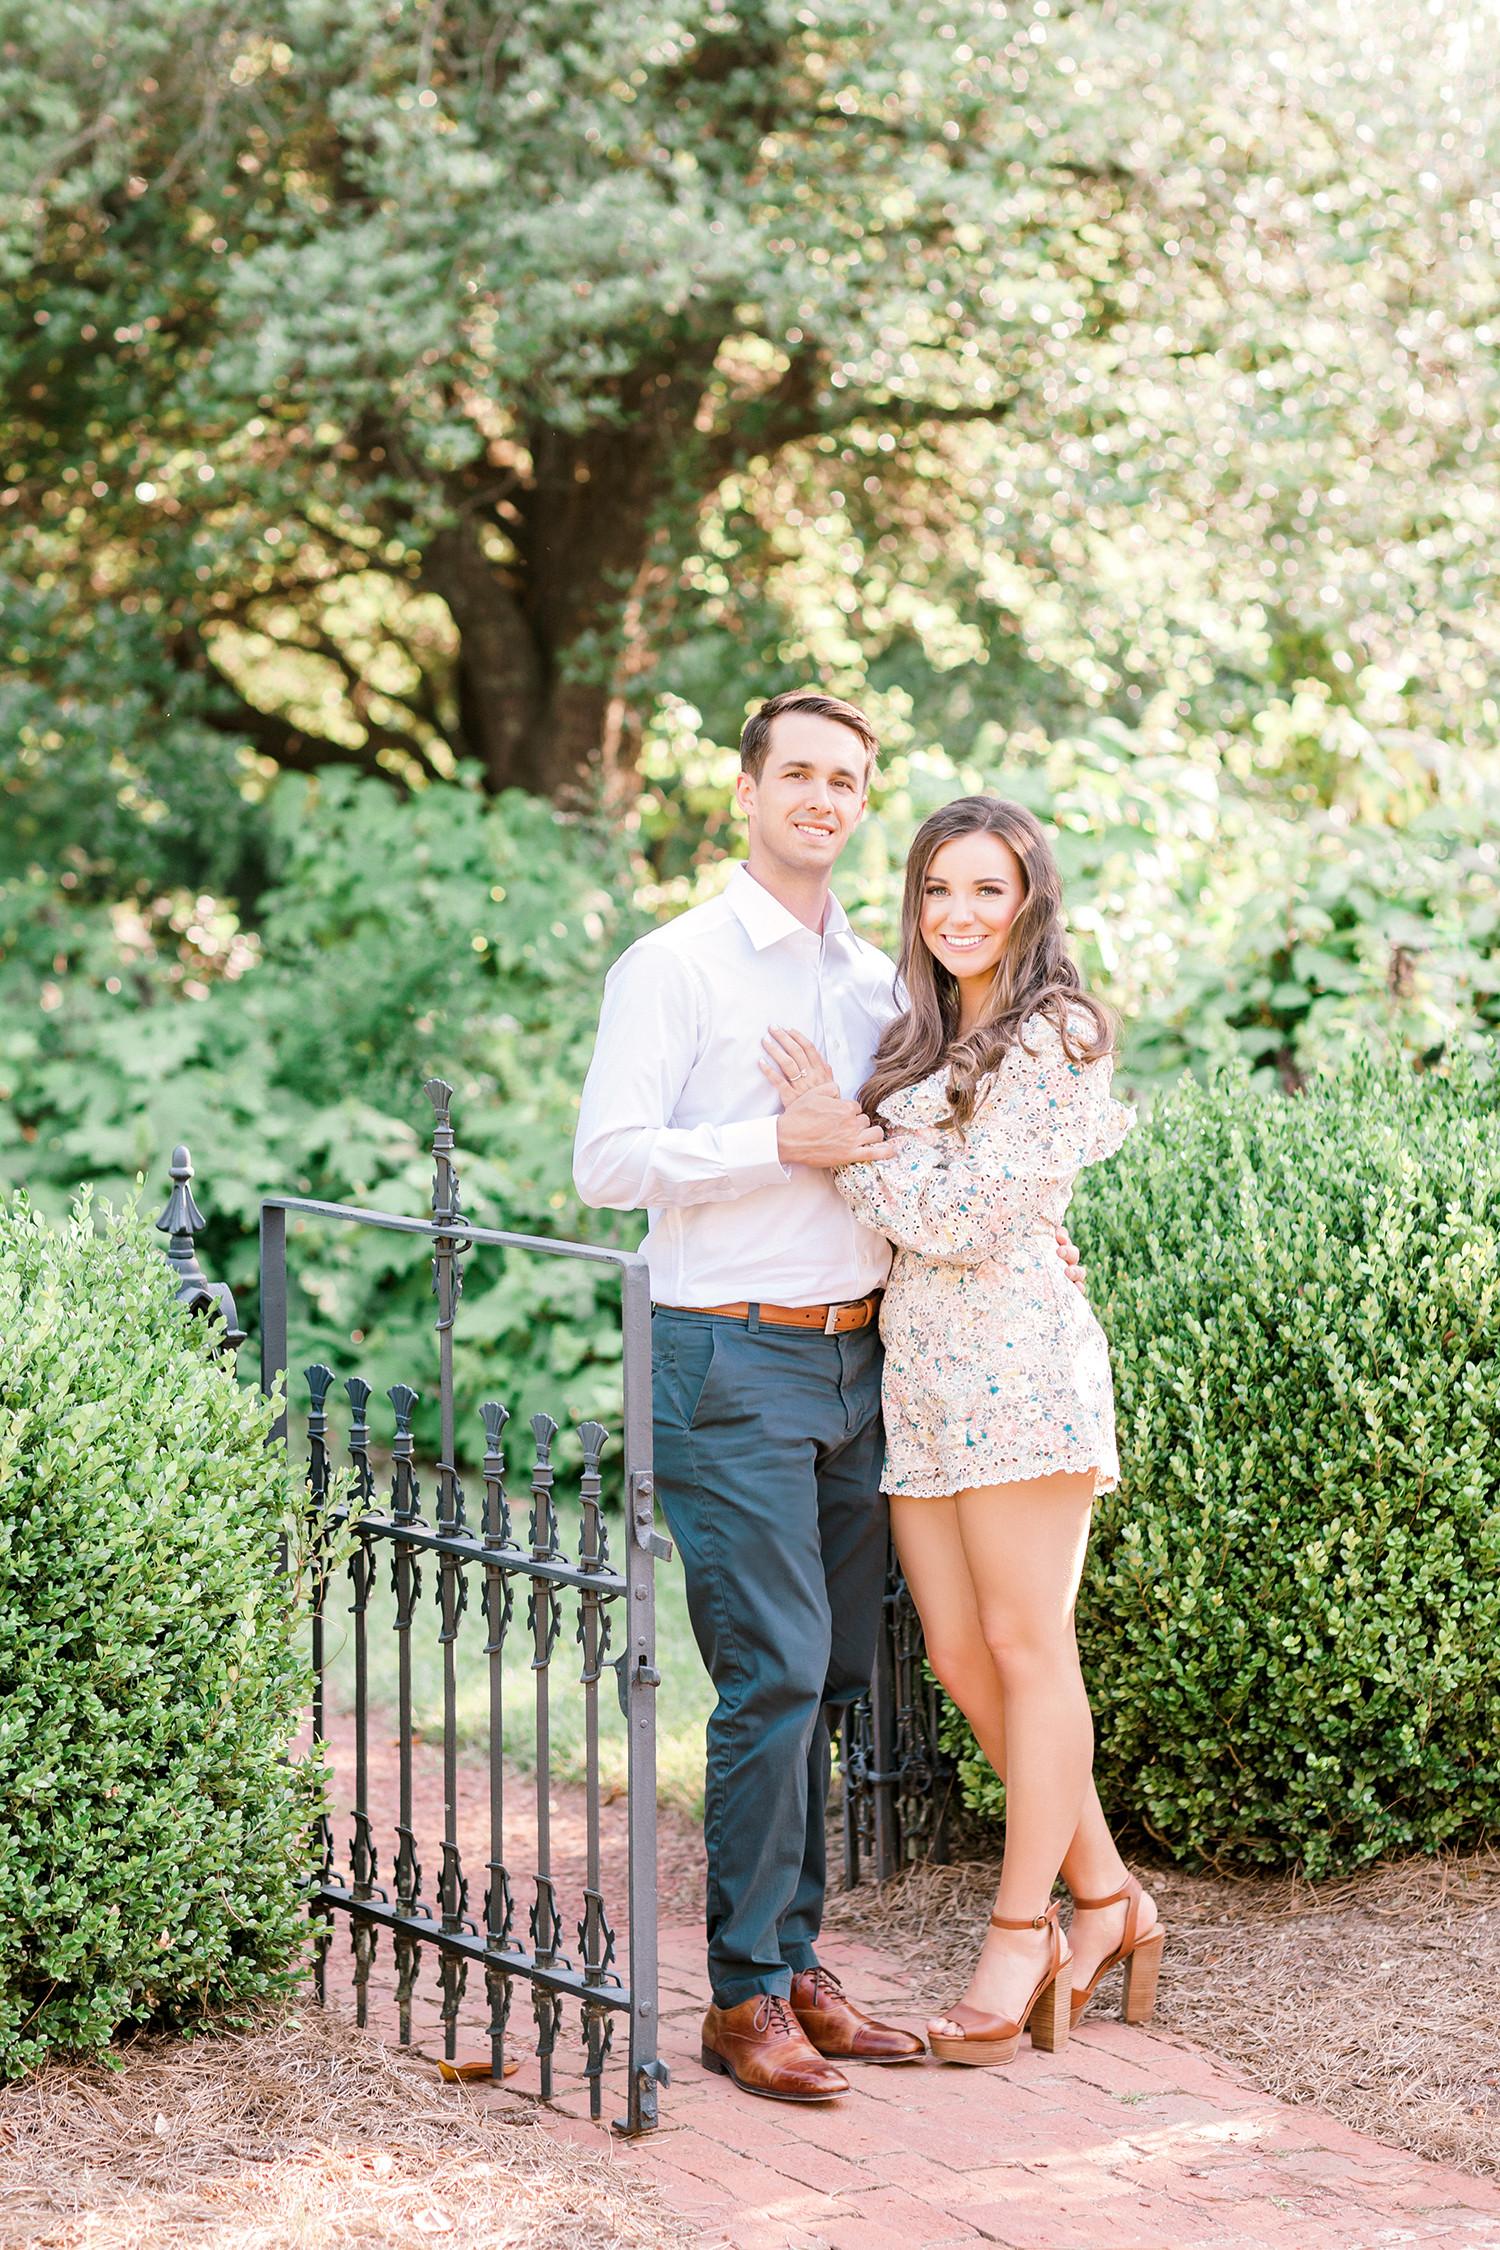 Sawyer + Summer Film Engagement at Kiesel Park in Auburn, Alabama